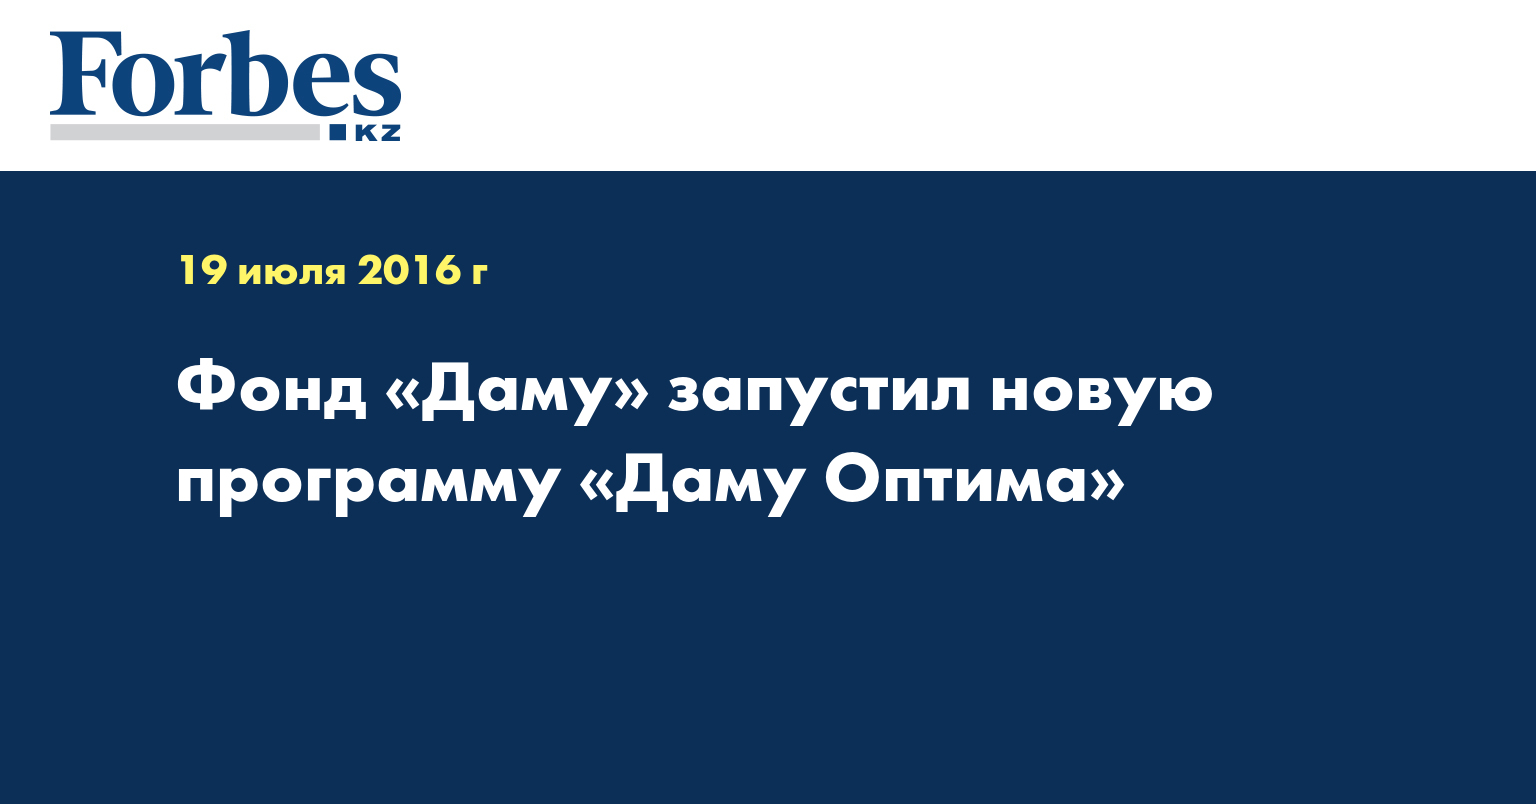 Фонд «Даму» запустил новую программу «Даму Оптима»